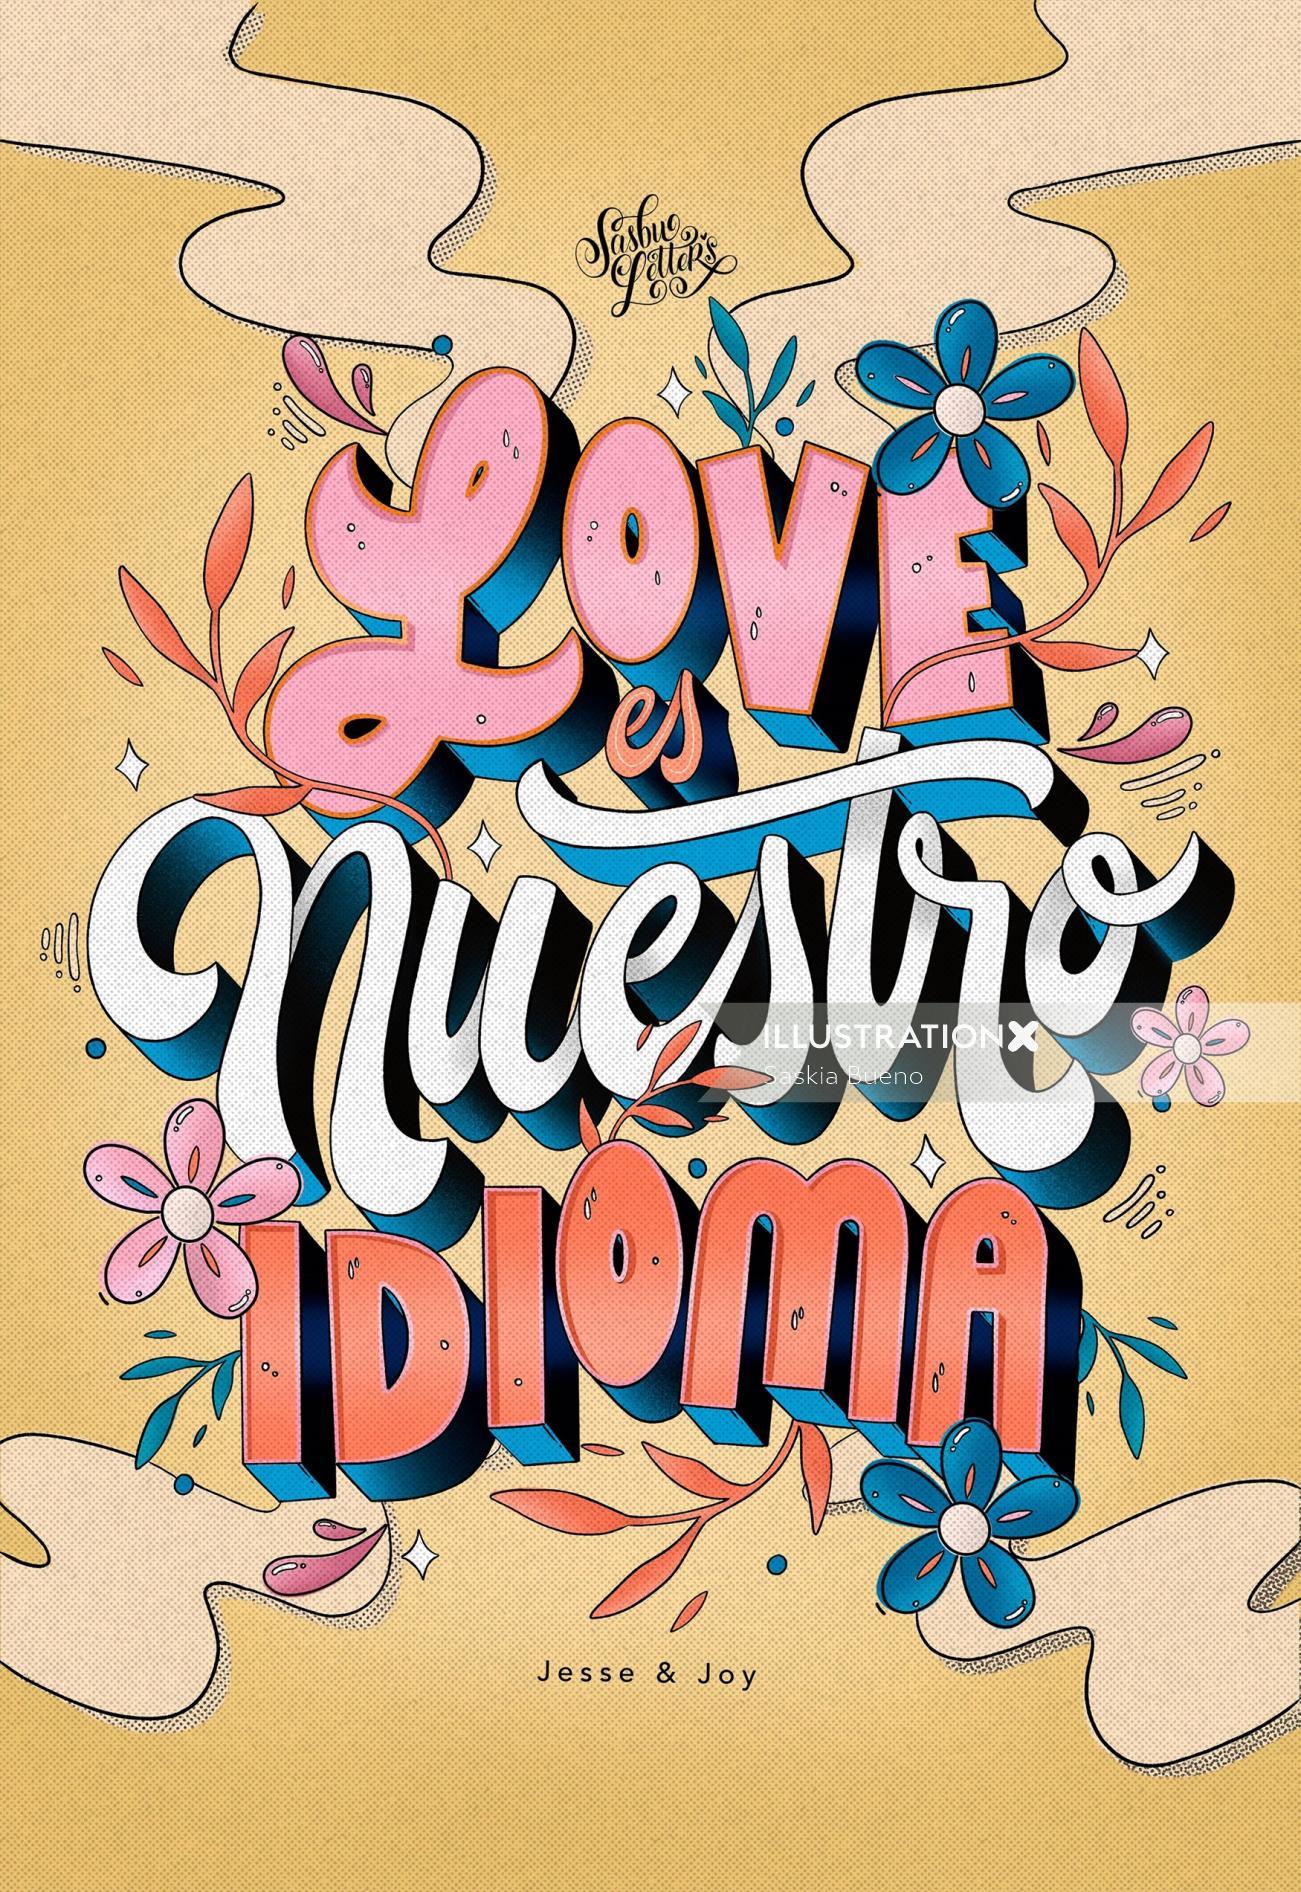 Love Nuestro Idioma lettering illustration